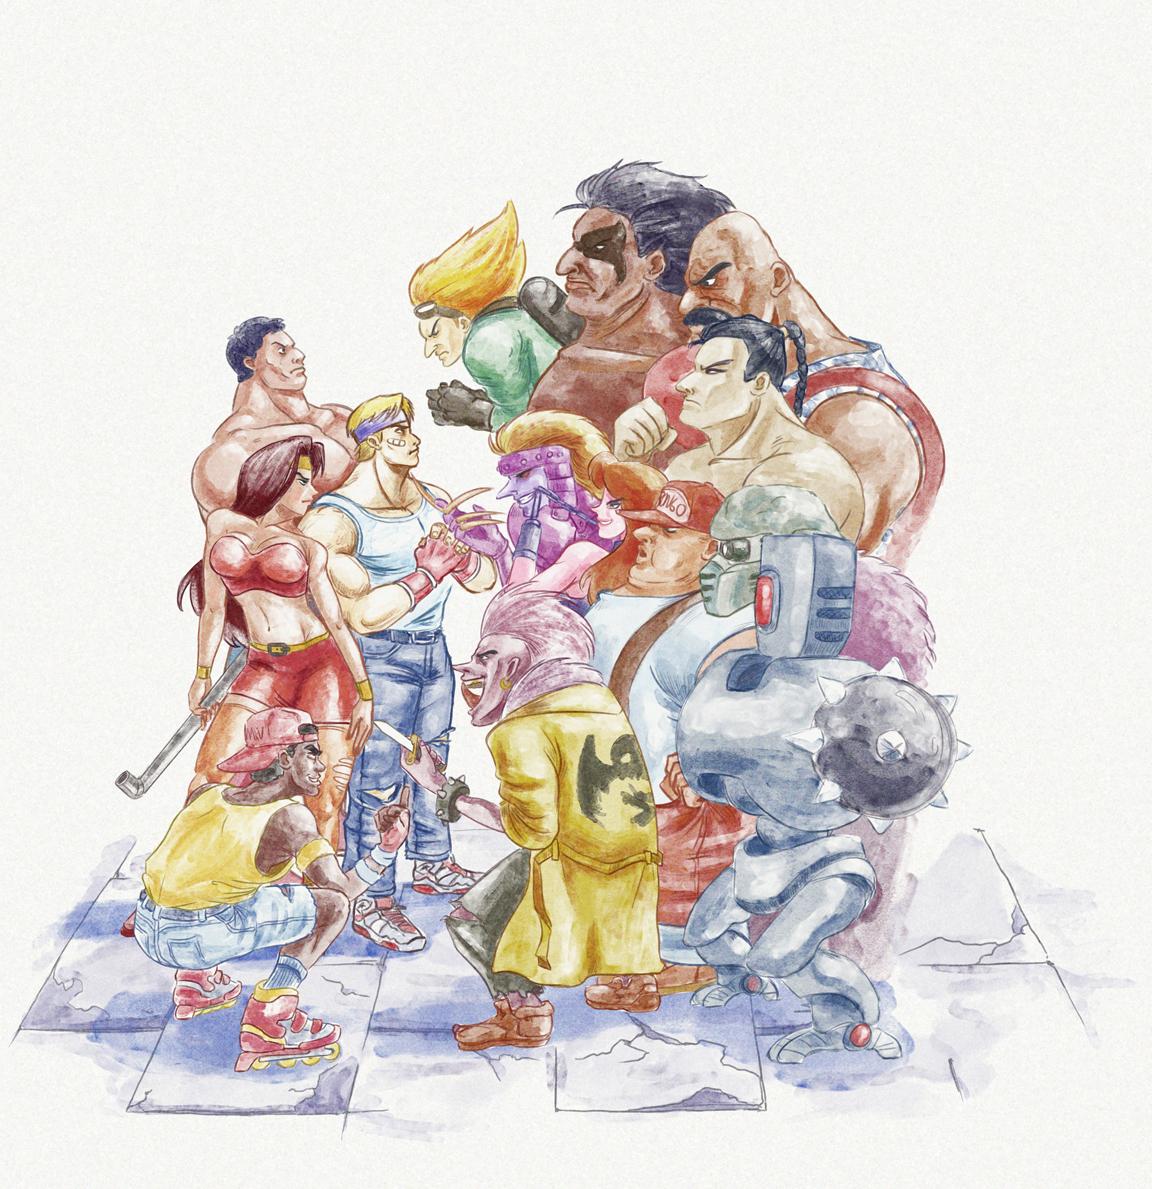 Streets of Rage 2 - 80s Capcom Style